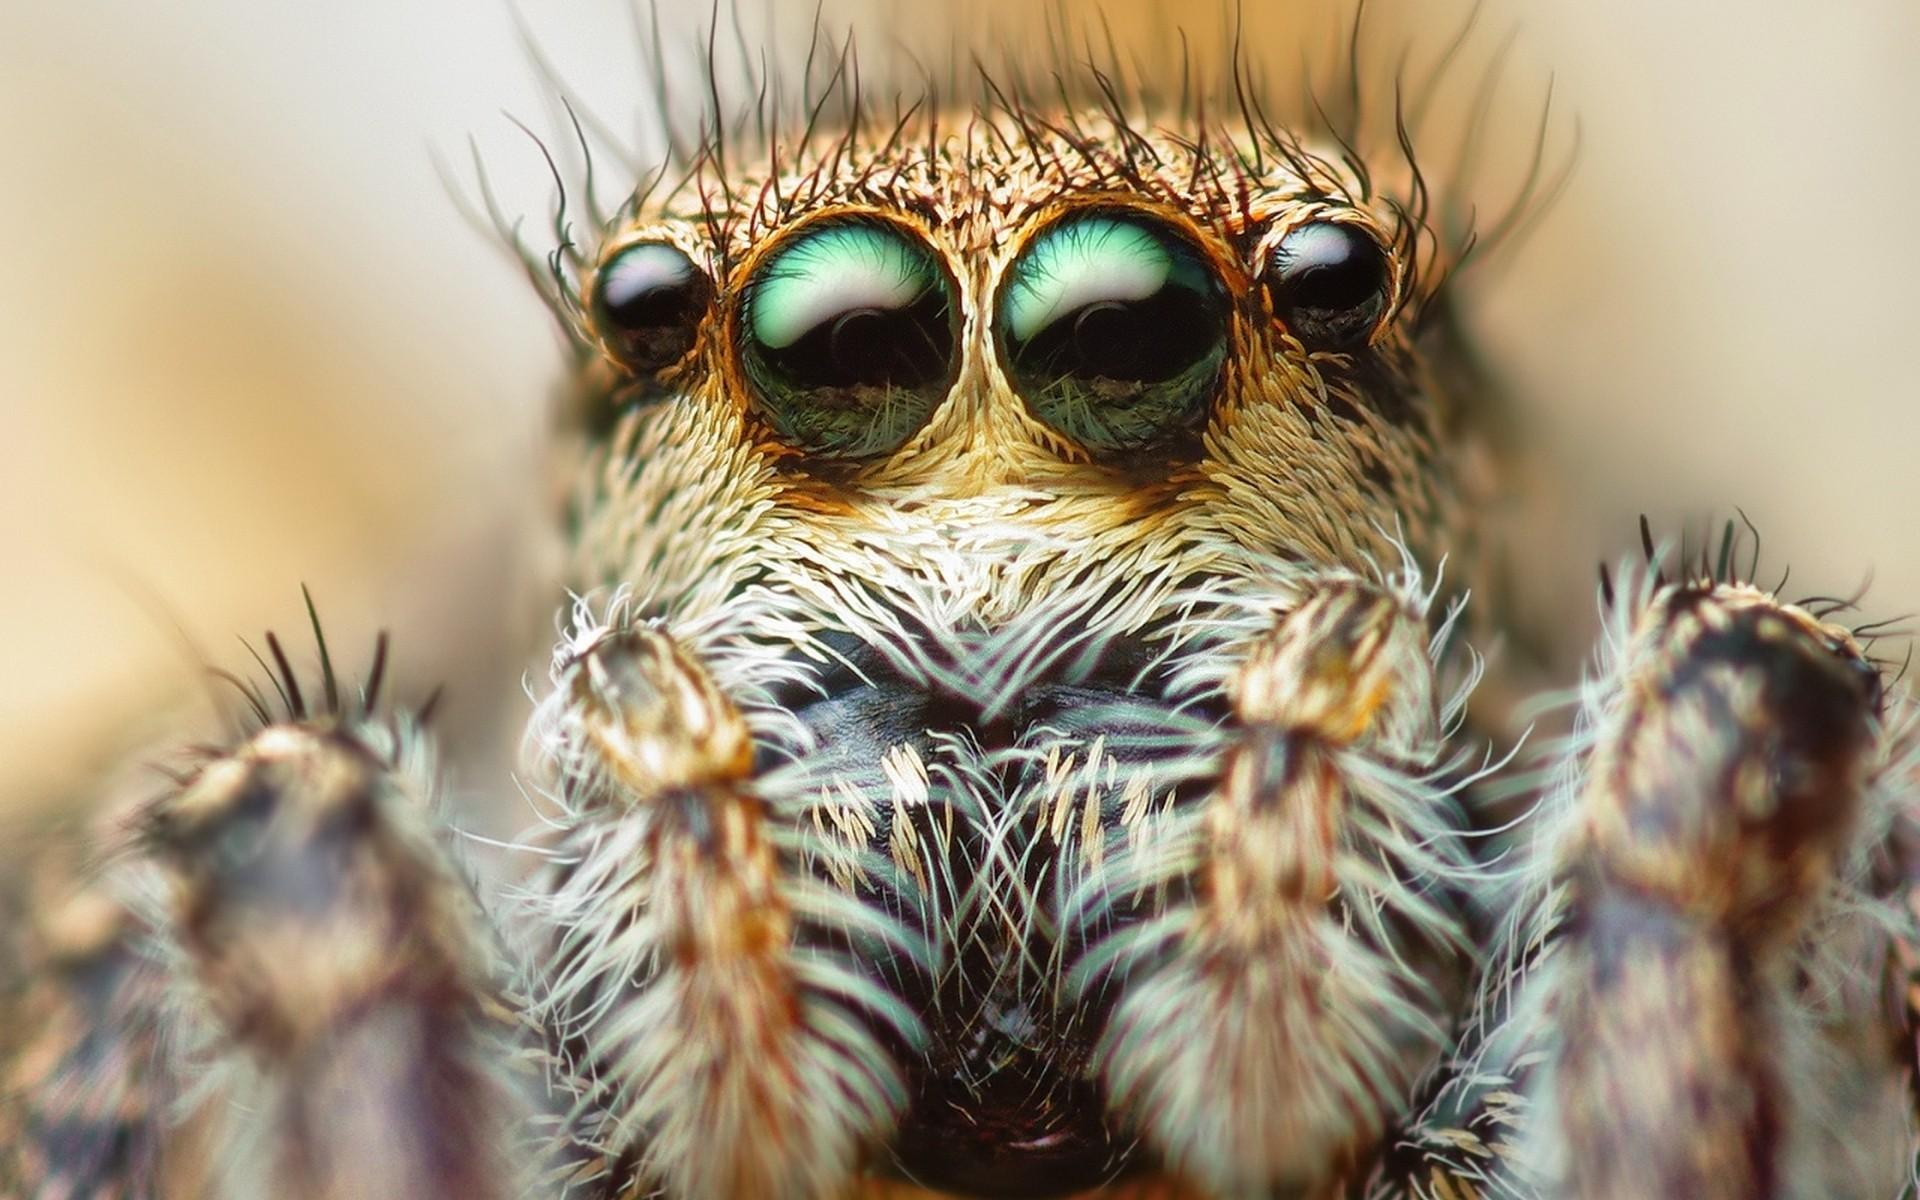 Scary Spider HD Desktop Wallpapers | digitalhint.net